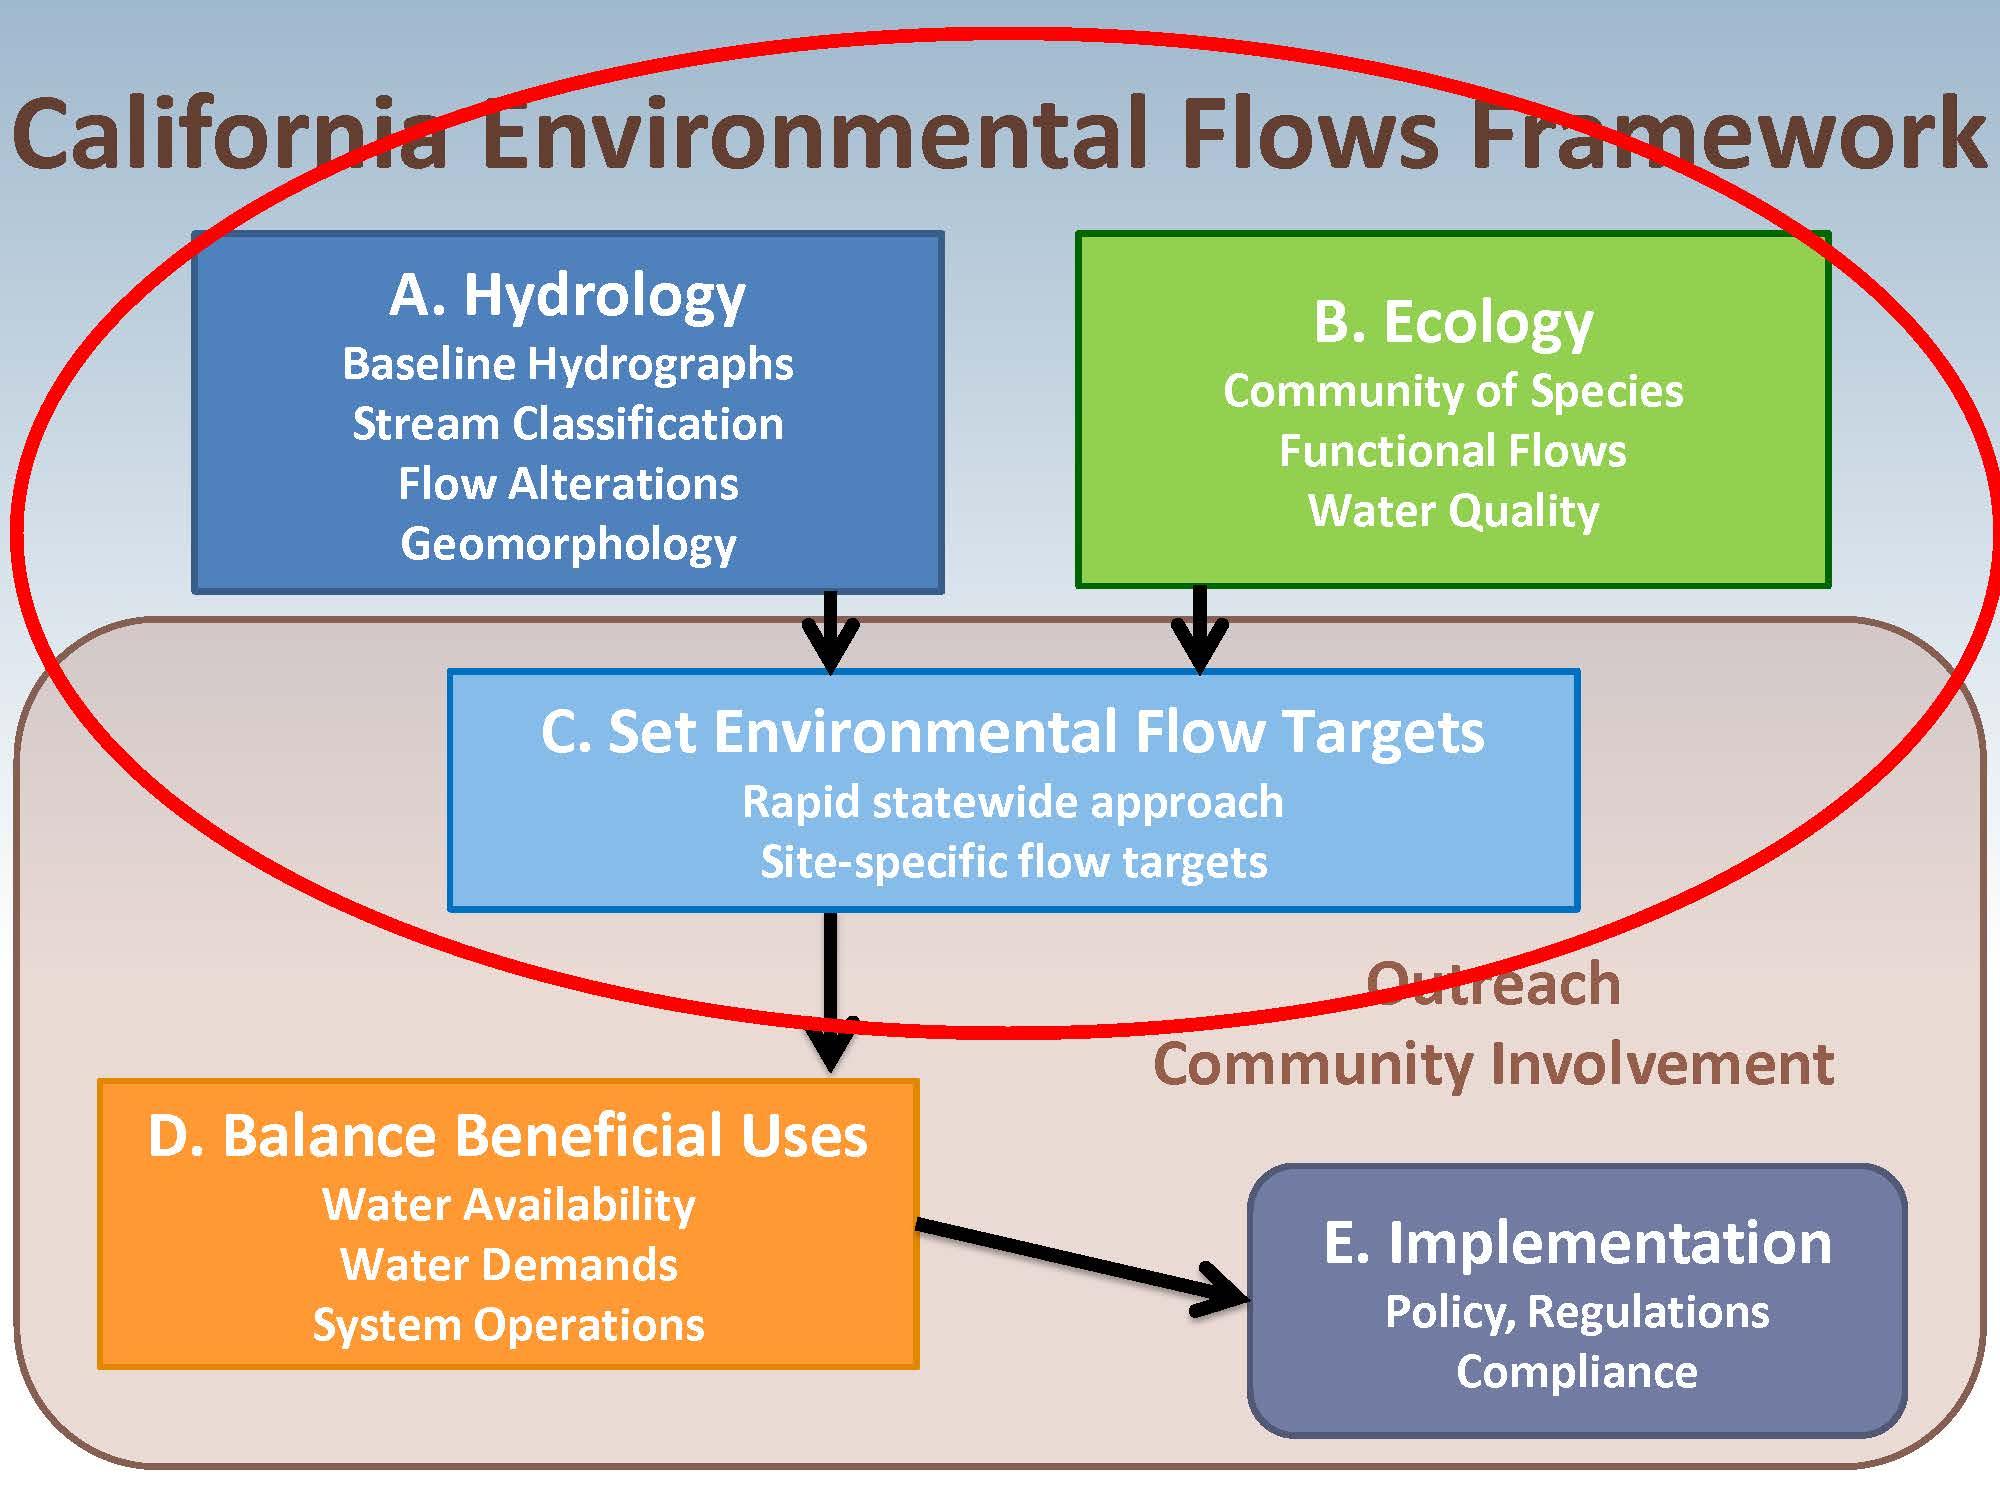 BROWN BAG SEMINAR Development of Re mended Flow Tar s to